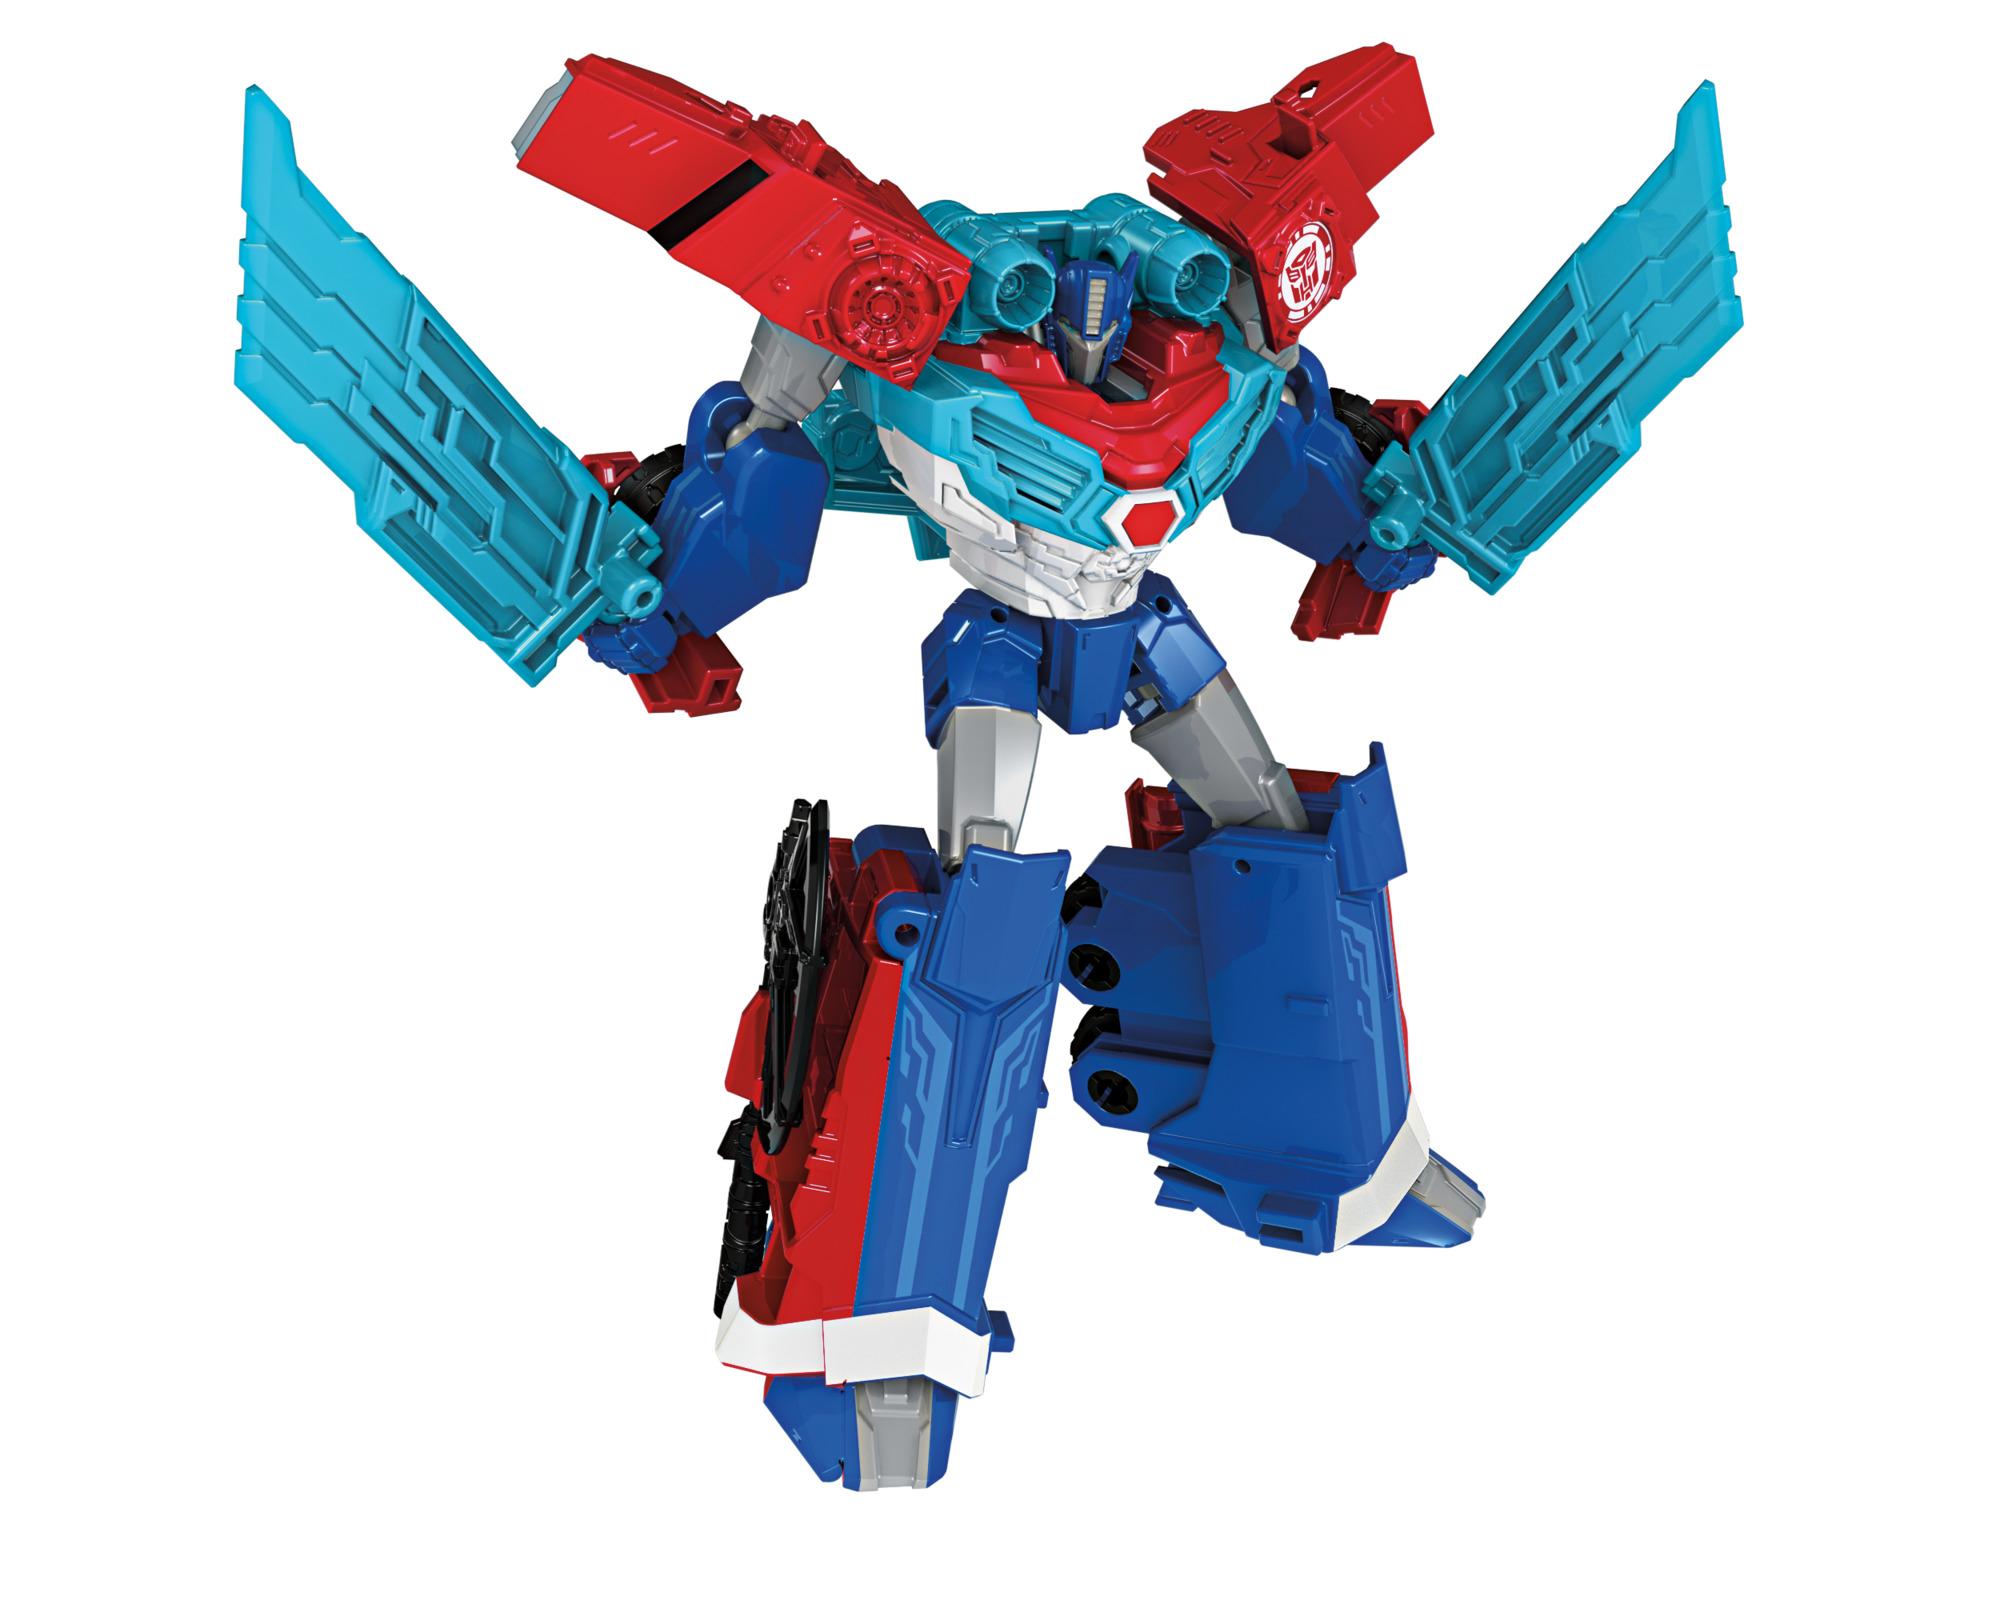 341152 Warrior Power Surge Optimus Prime Robot